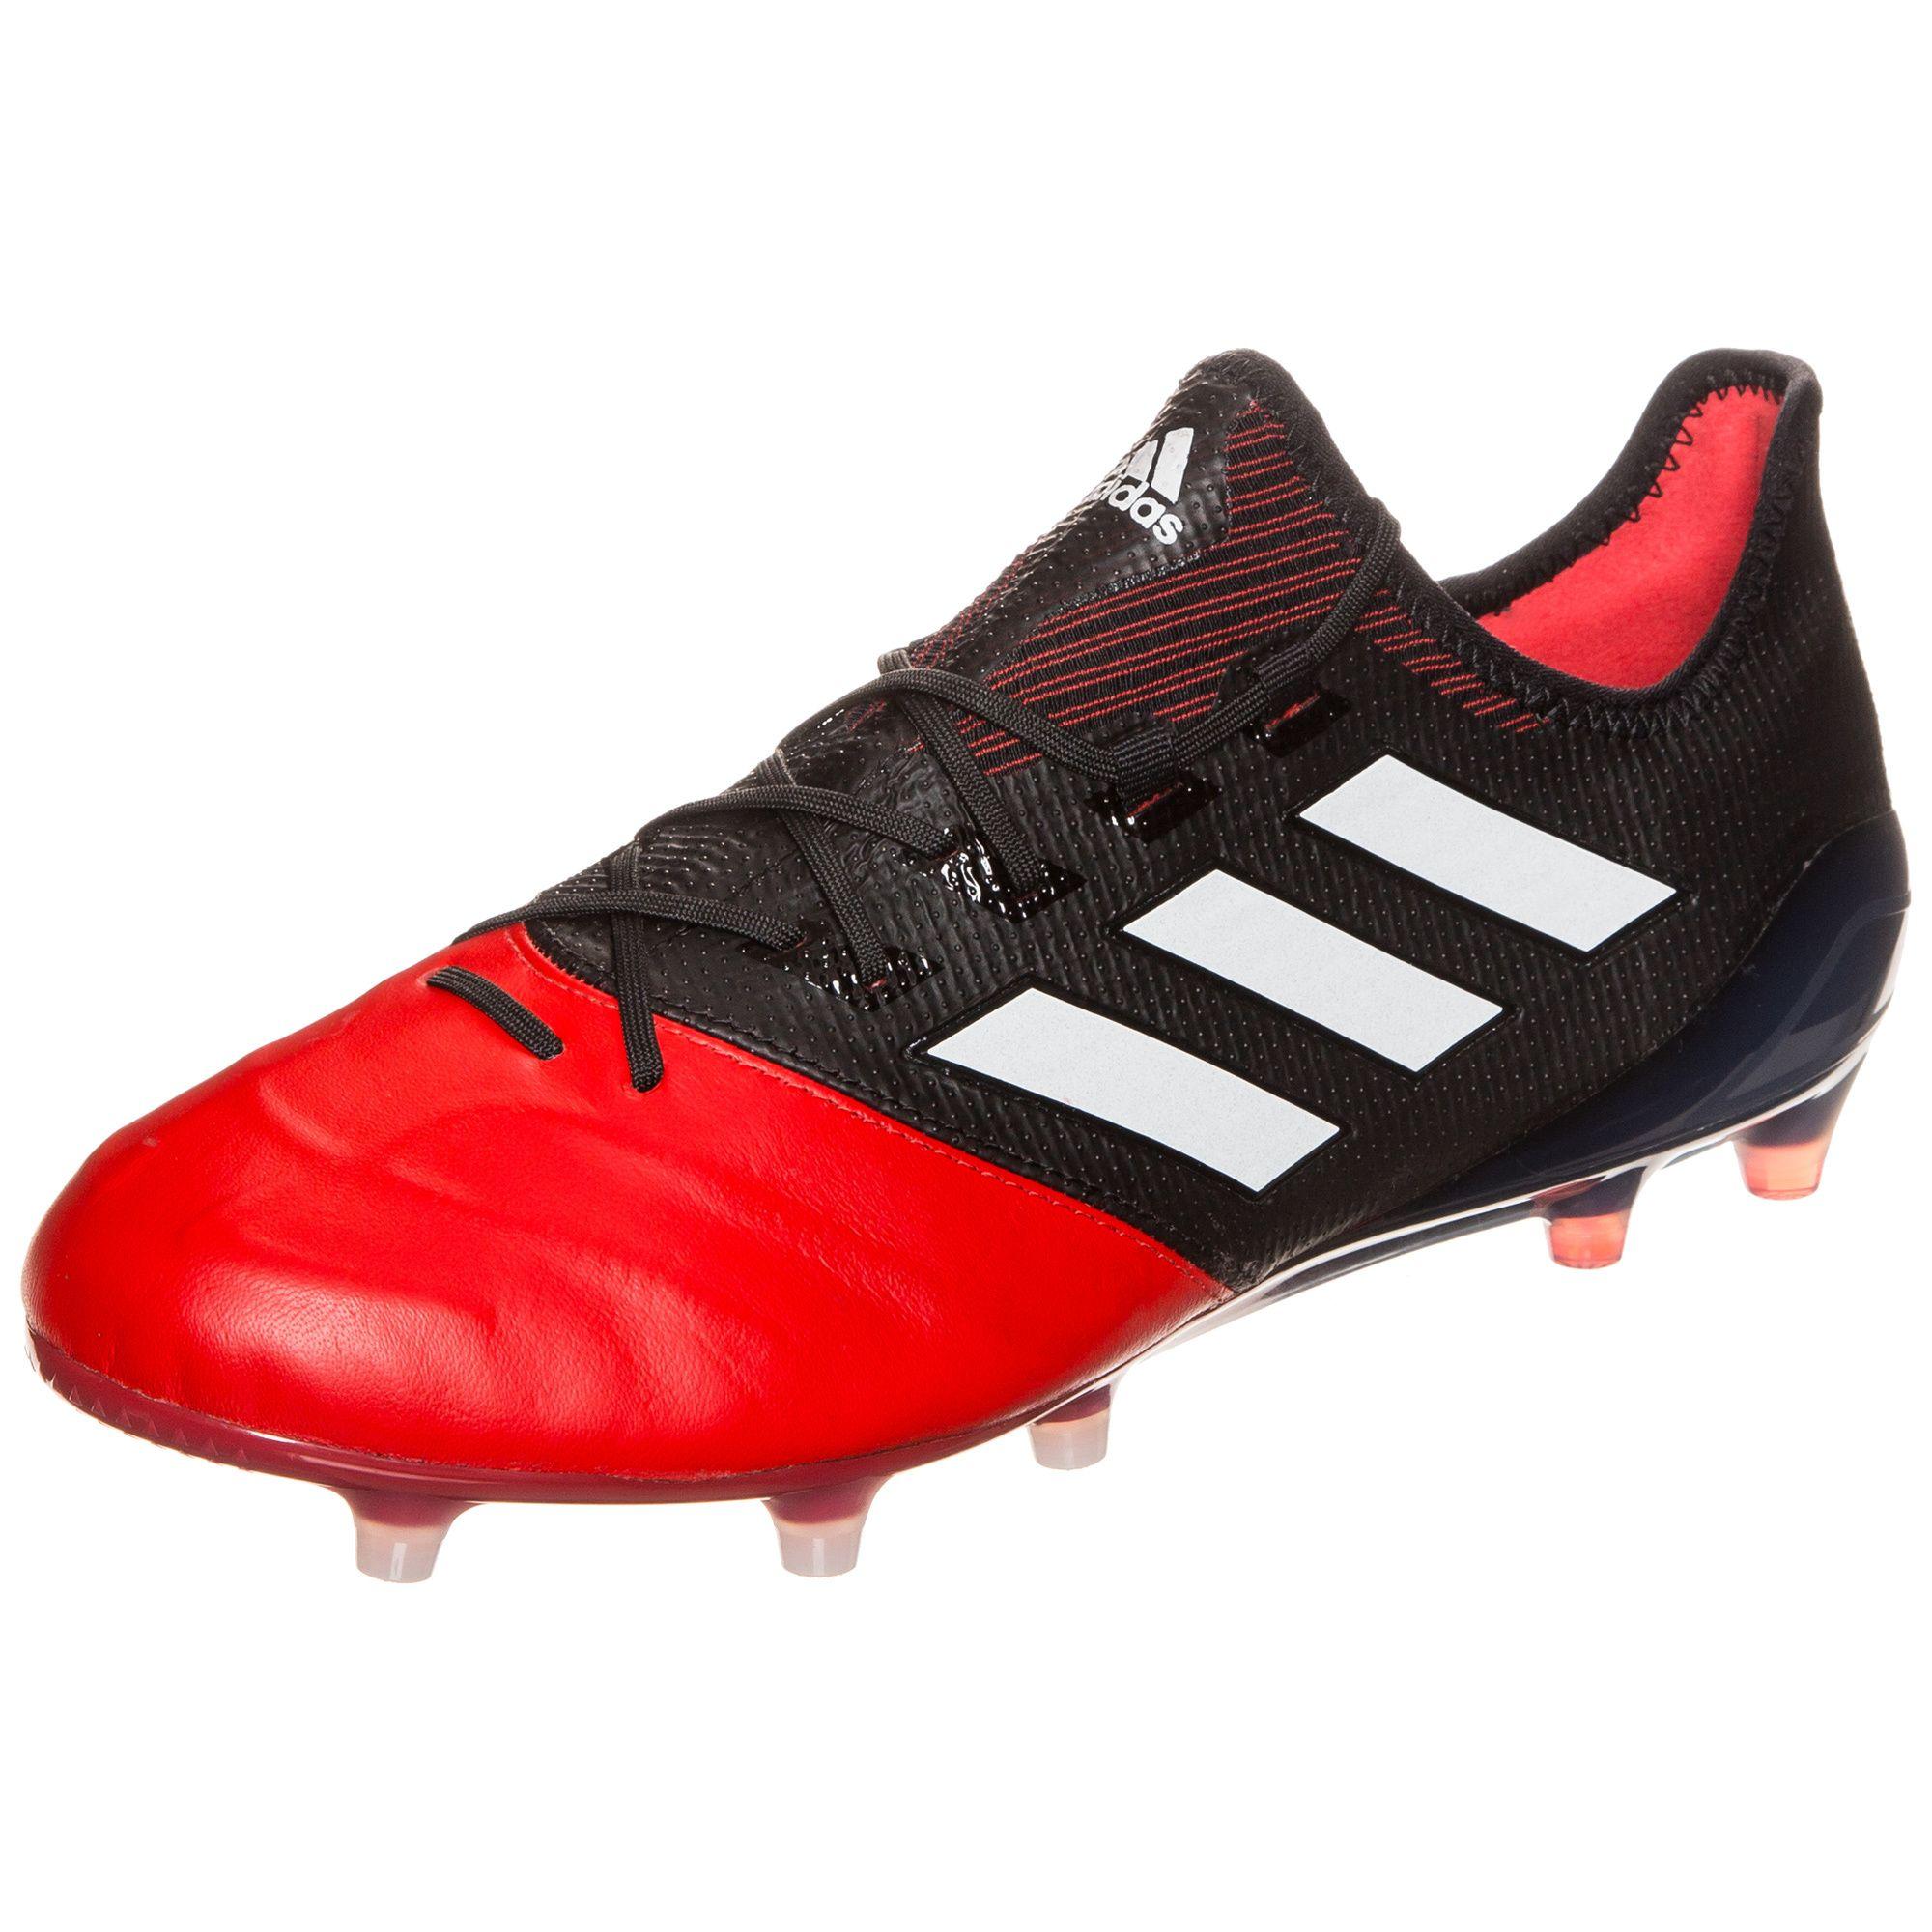 ADIDAS PERFORMANCE adidas Performance ACE 17.1 Leather FG Fußballschuh Herren